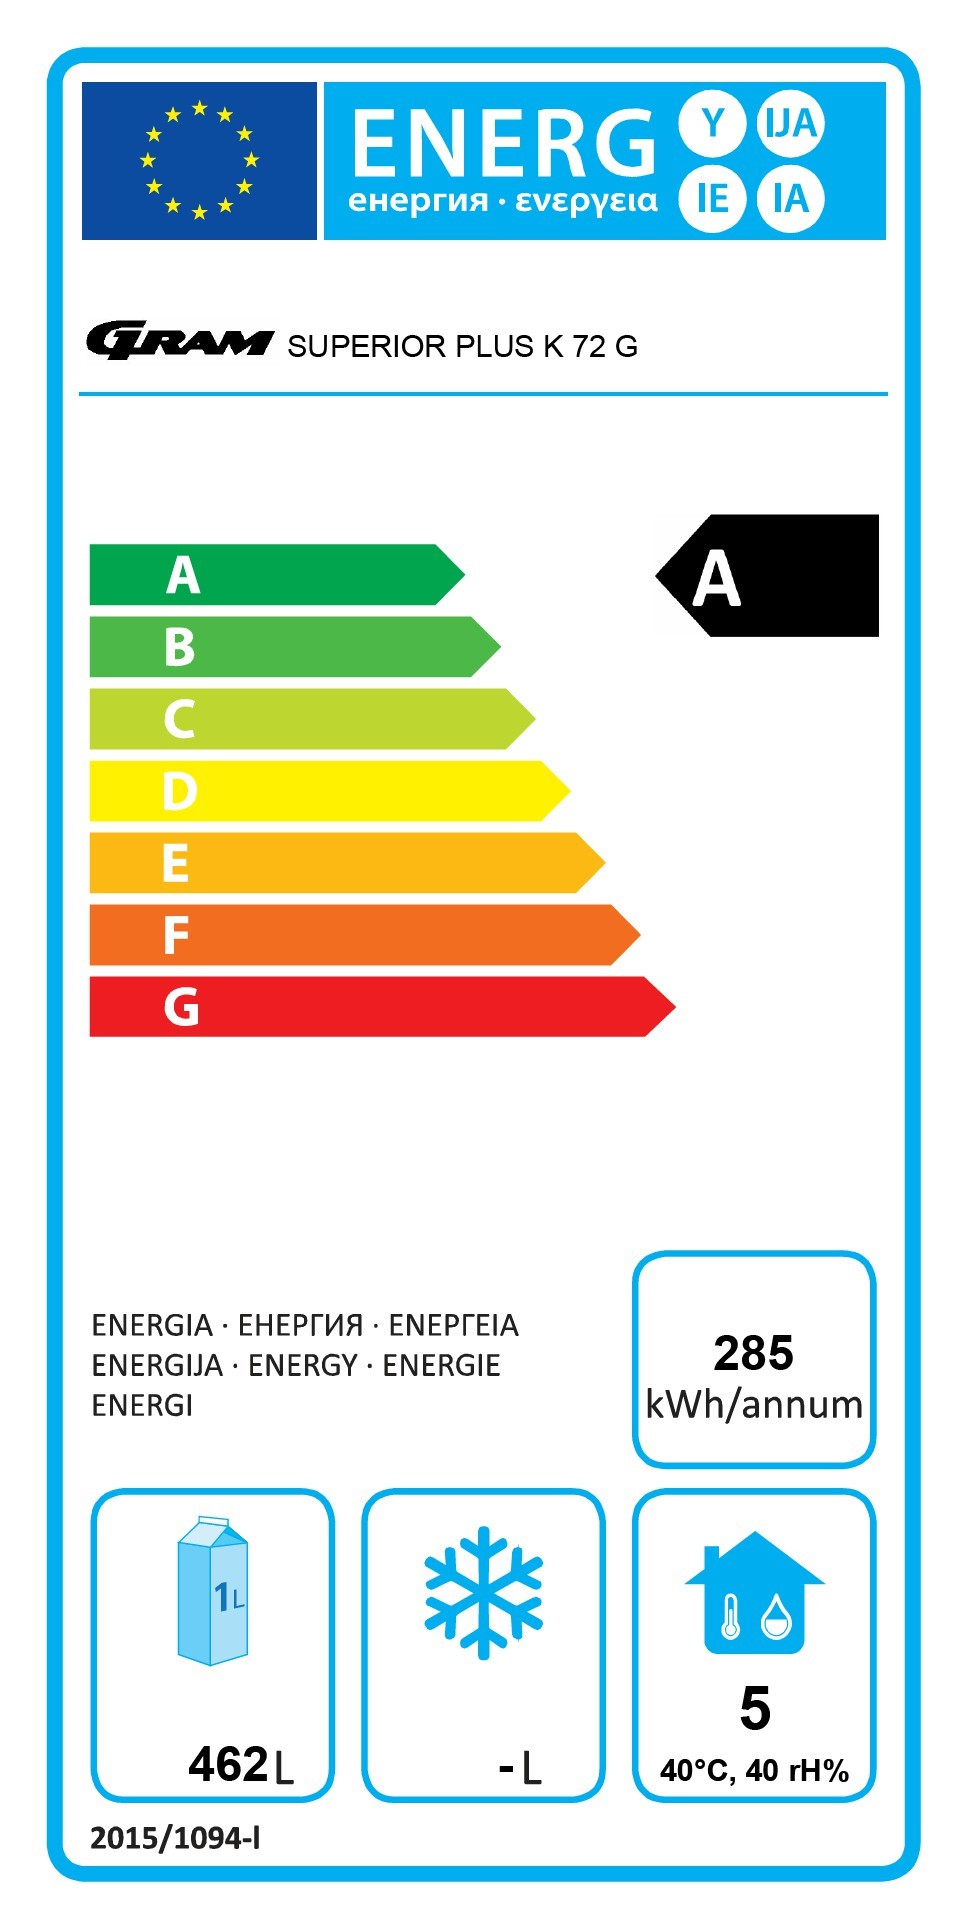 SUPERIOR PLUS K 72 RAG C1 4S 610 Ltr Single Door Upright Fridge Energy Rating